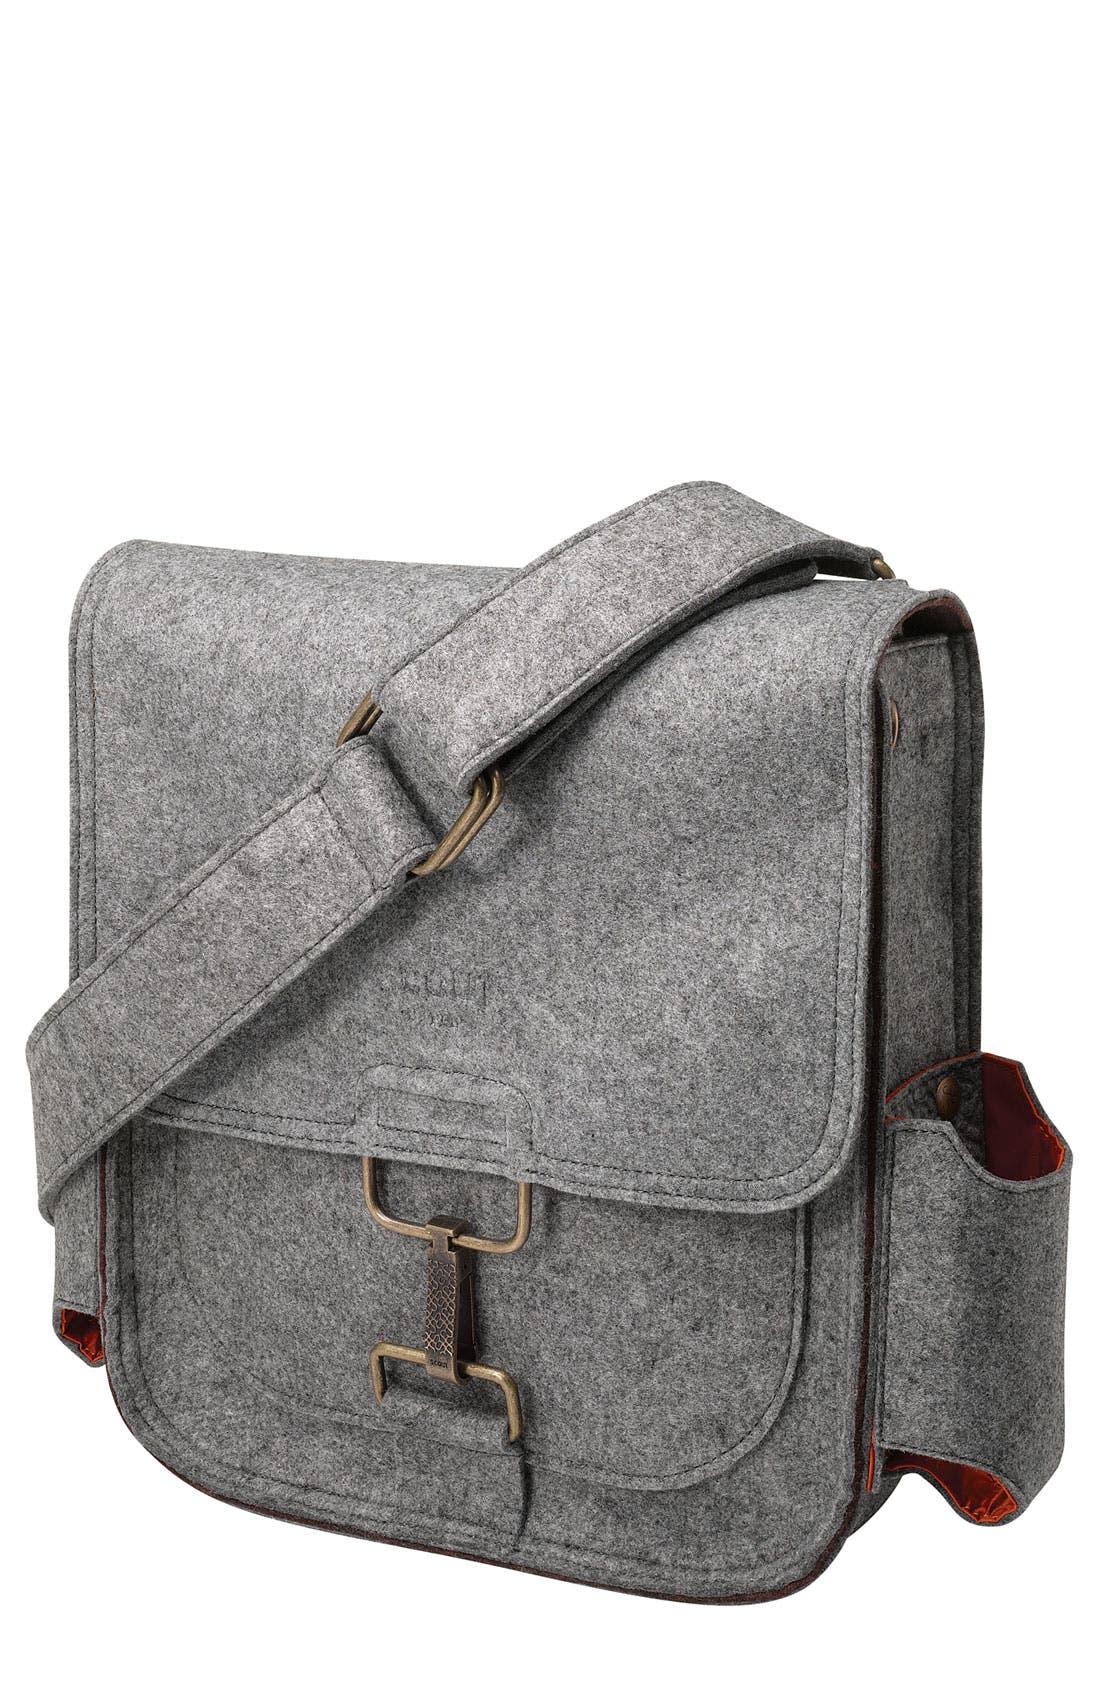 Alternate Image 1 Selected - Petunia Pickle Bottom 'Scout Journey Pack ' Diaper Bag